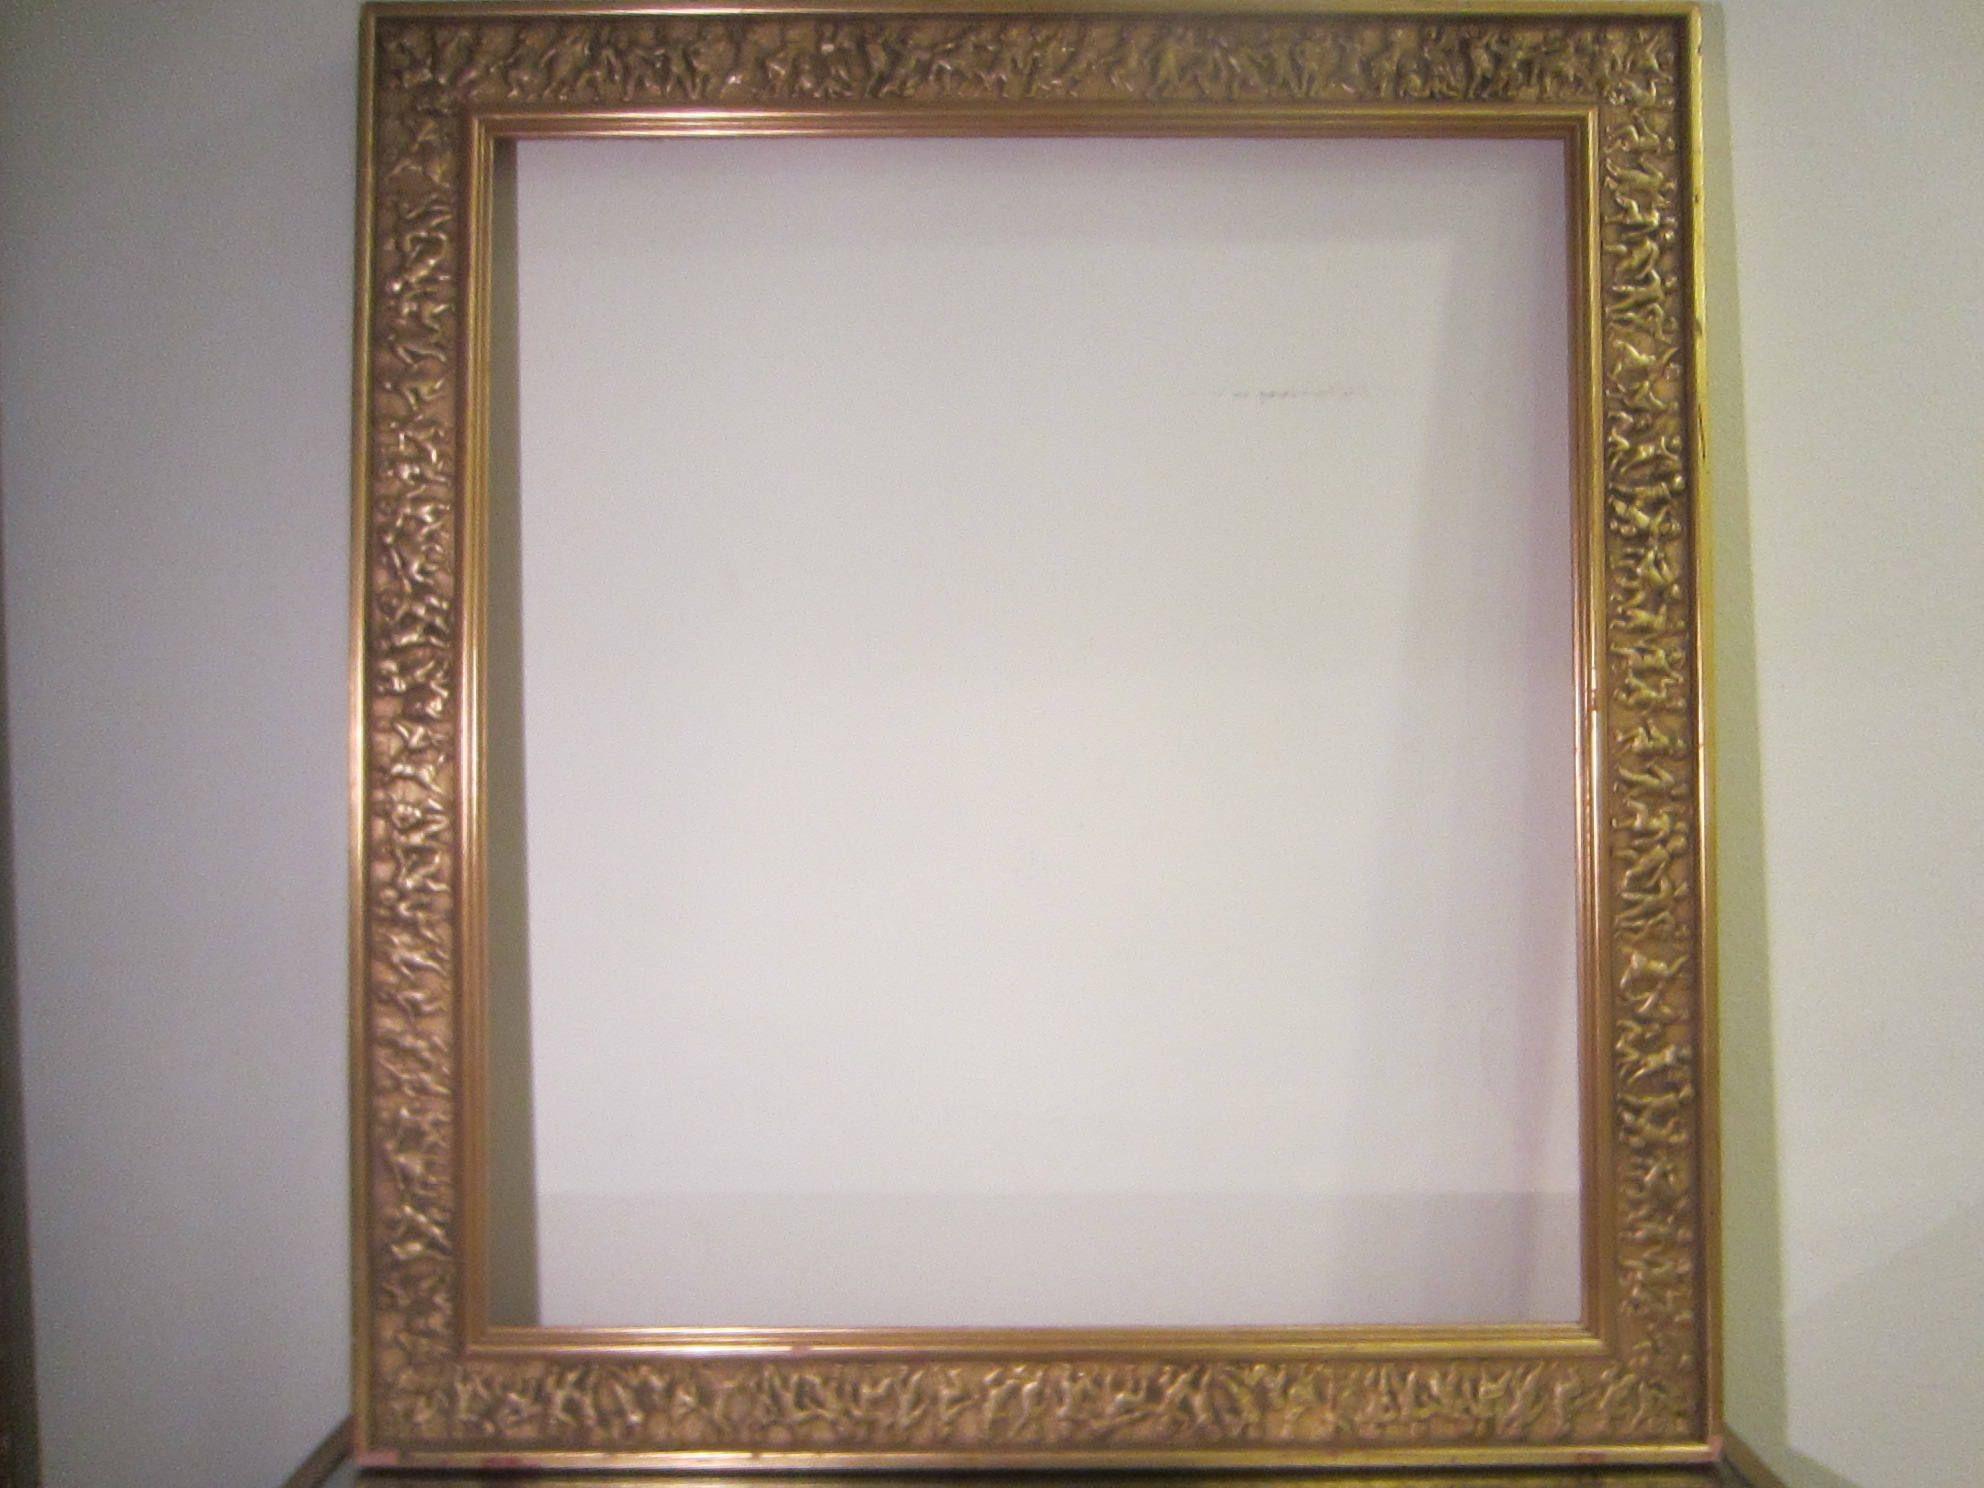 Gold Leaf Picture Frame Raised Figures Large Frame Picture Frames Vintage Frames